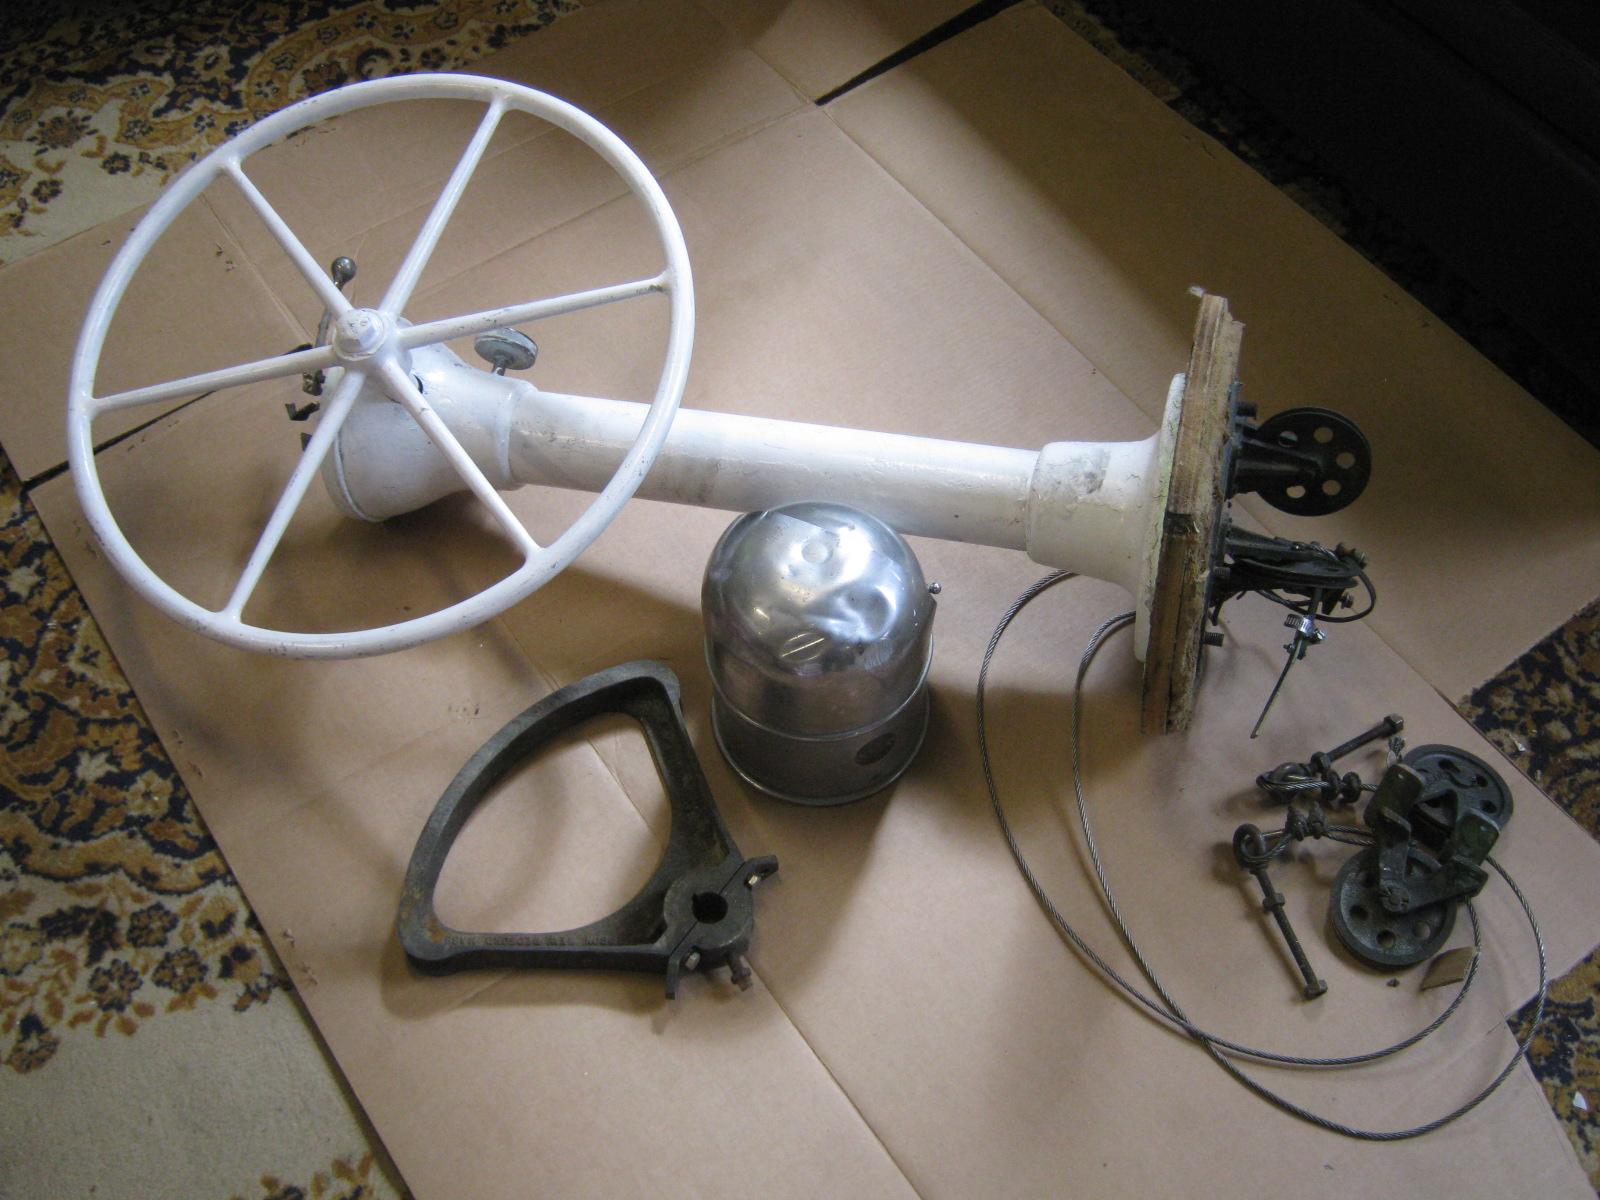 Edson Sailboat Yacht Pedestal Steering System W 24 Wheel